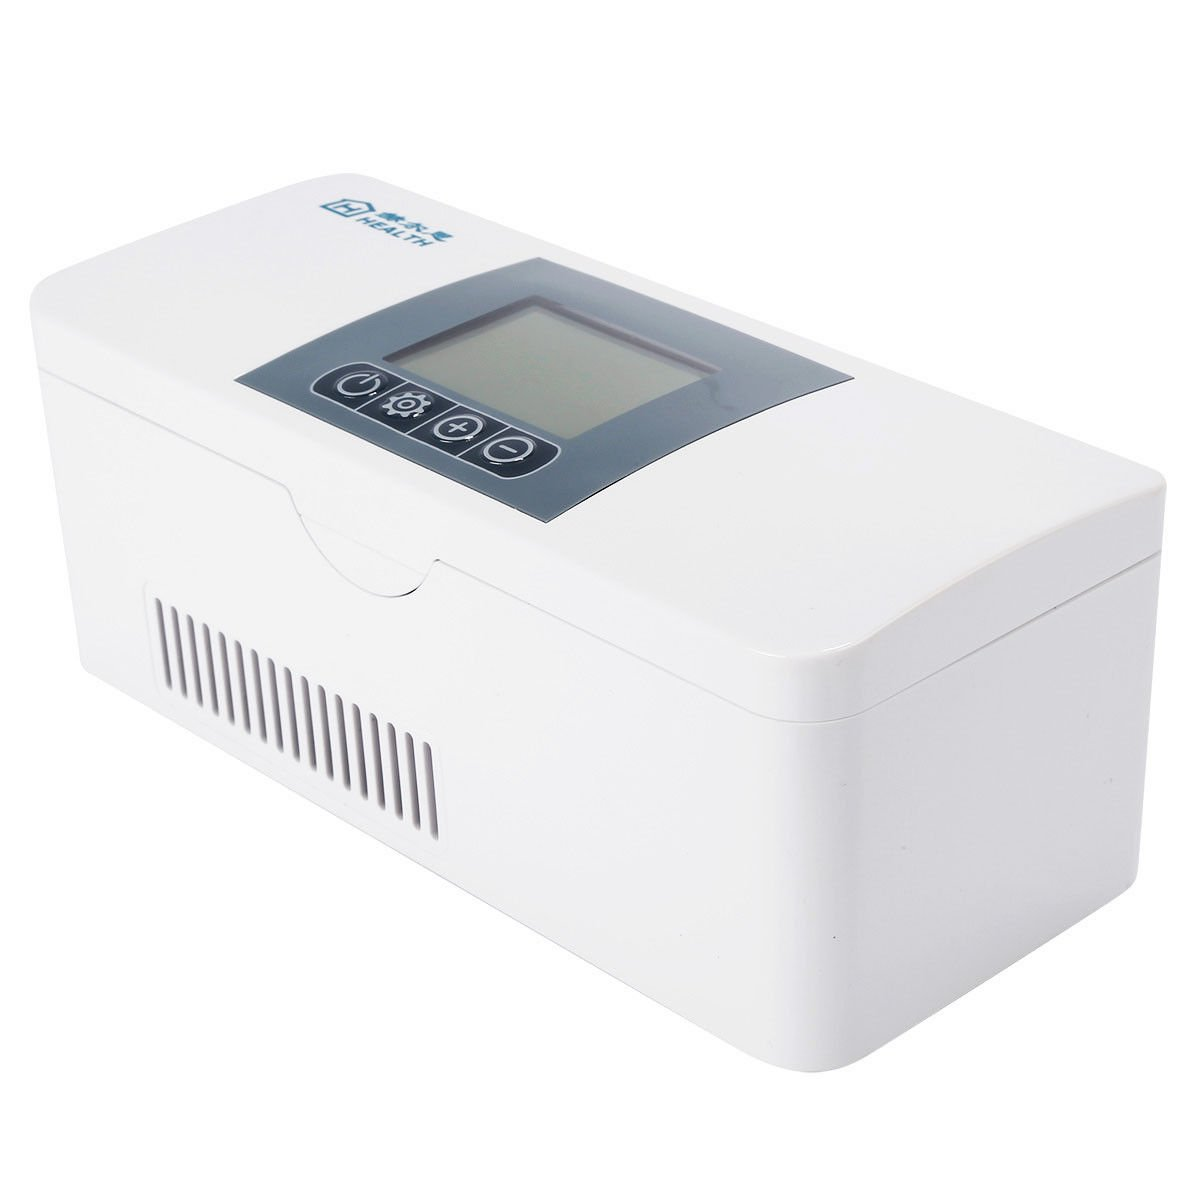 Tengchang Insulin Travel Medical Cooler case Lithium Battery Medicine Cooling Box Freezer by Tengchang